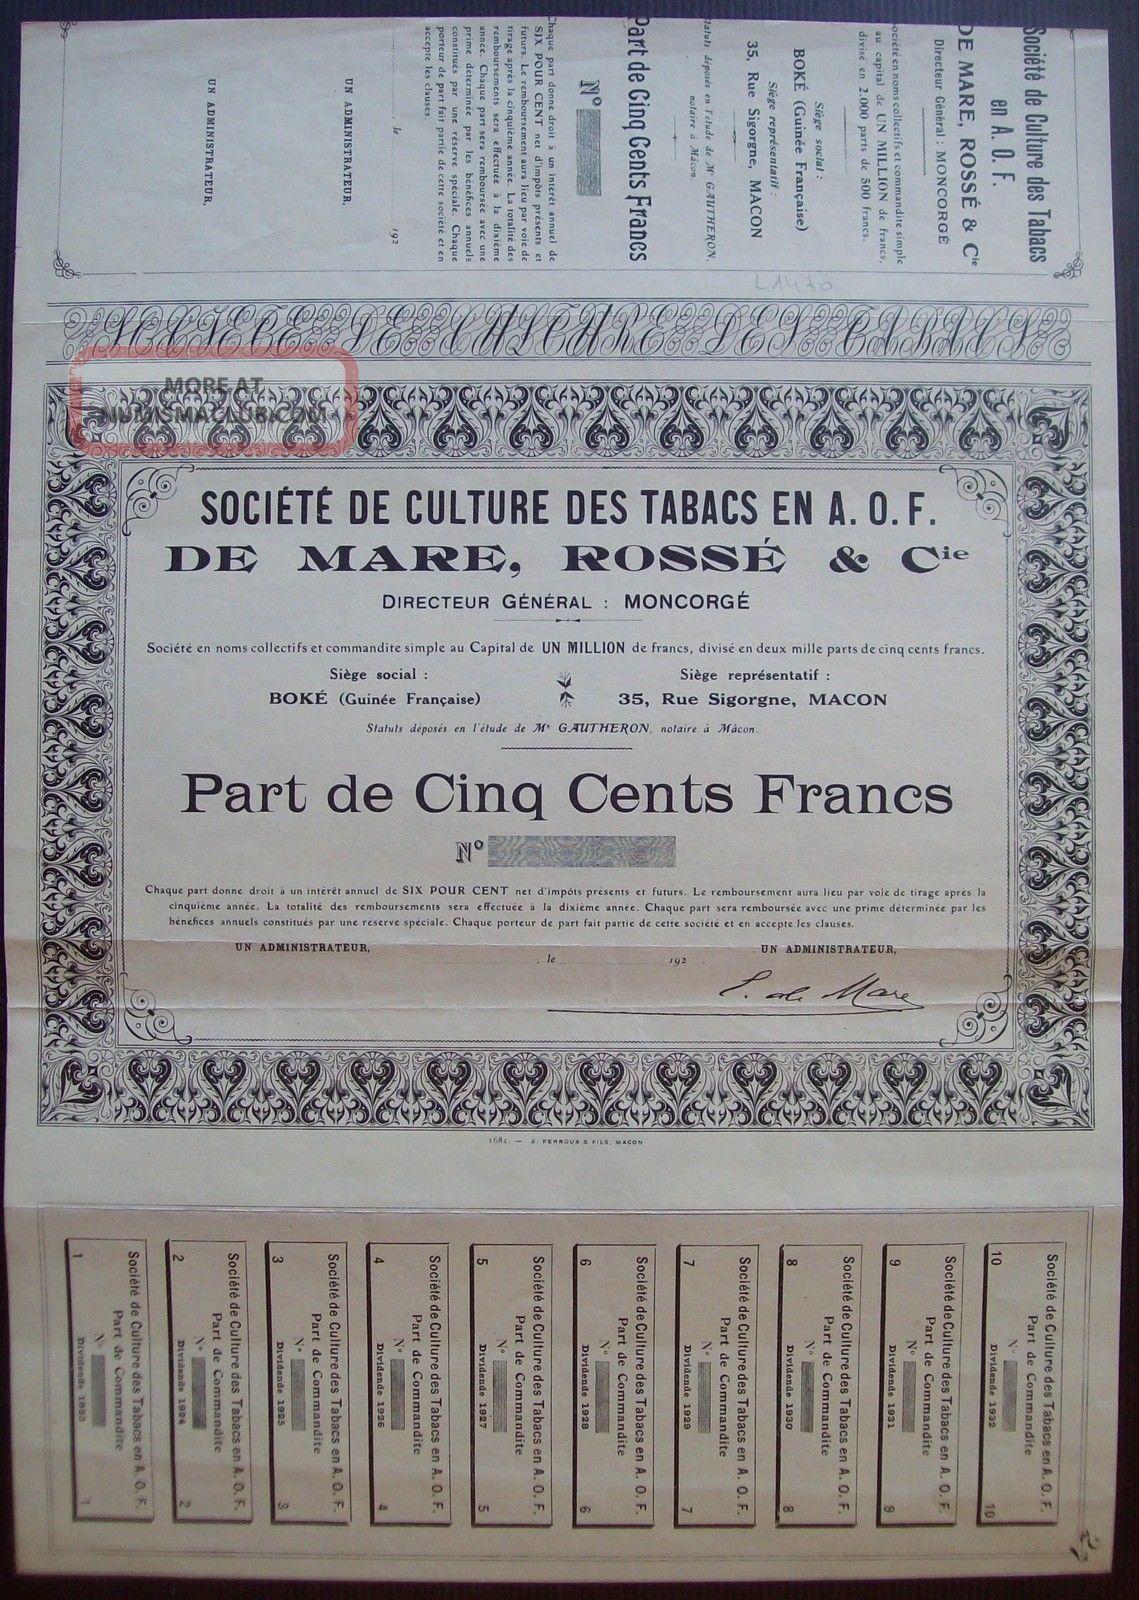 France 1923 Uncirculated Bond Tabacs De Mare Rosse Cie Macon. .  B994 World photo